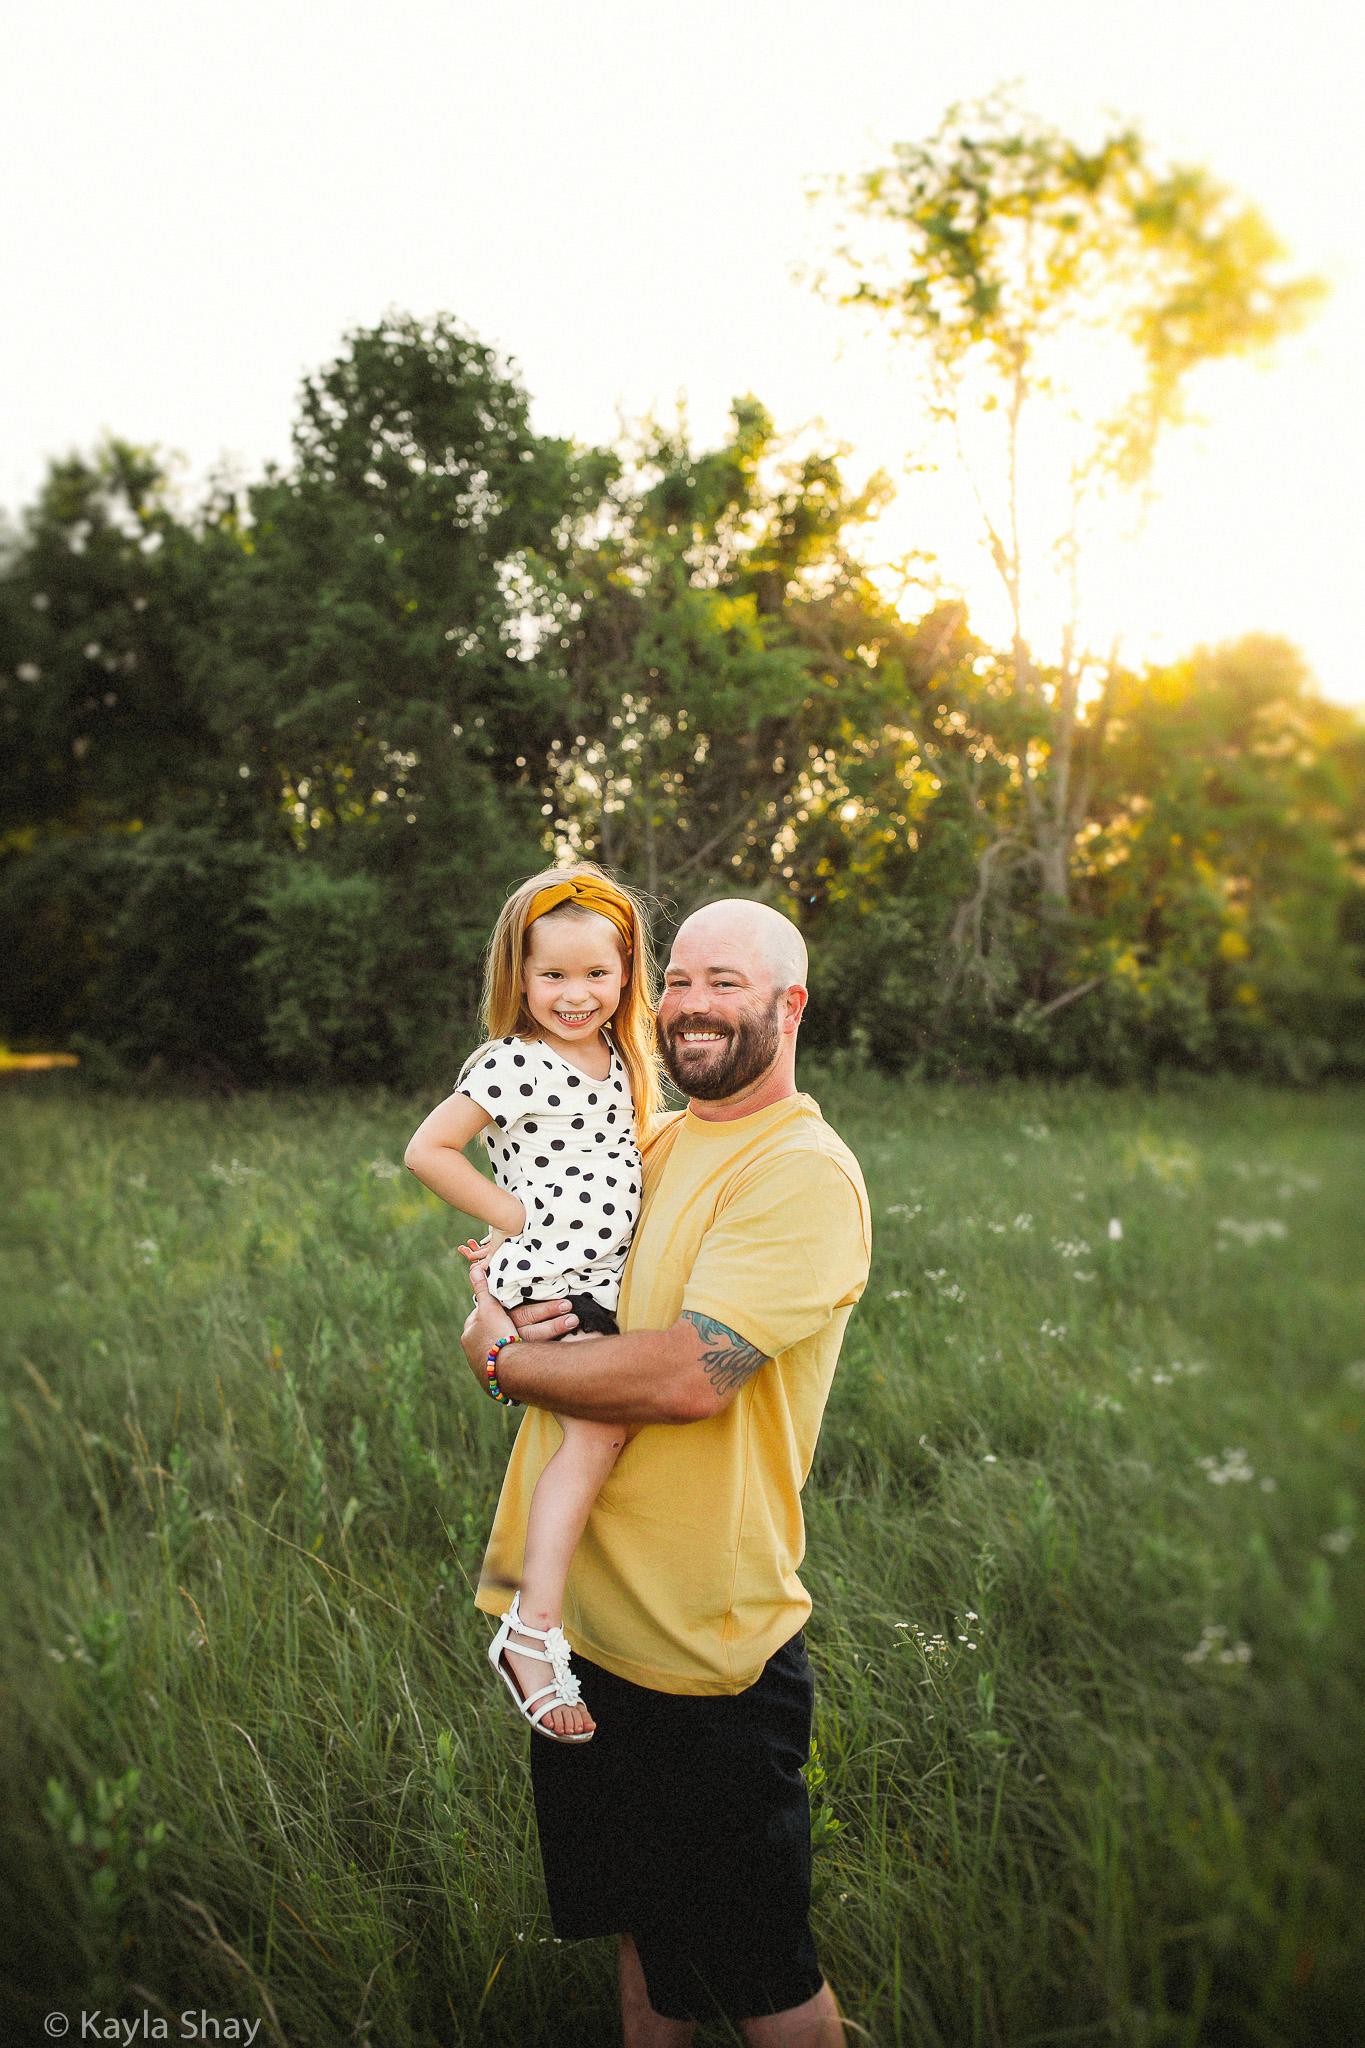 Family Portrait photographer, Lawrence Kansas, Olathe ks photographer, Overland park, lawrence ks photographer, newborn photographer, olathe, portraits, studio photographer